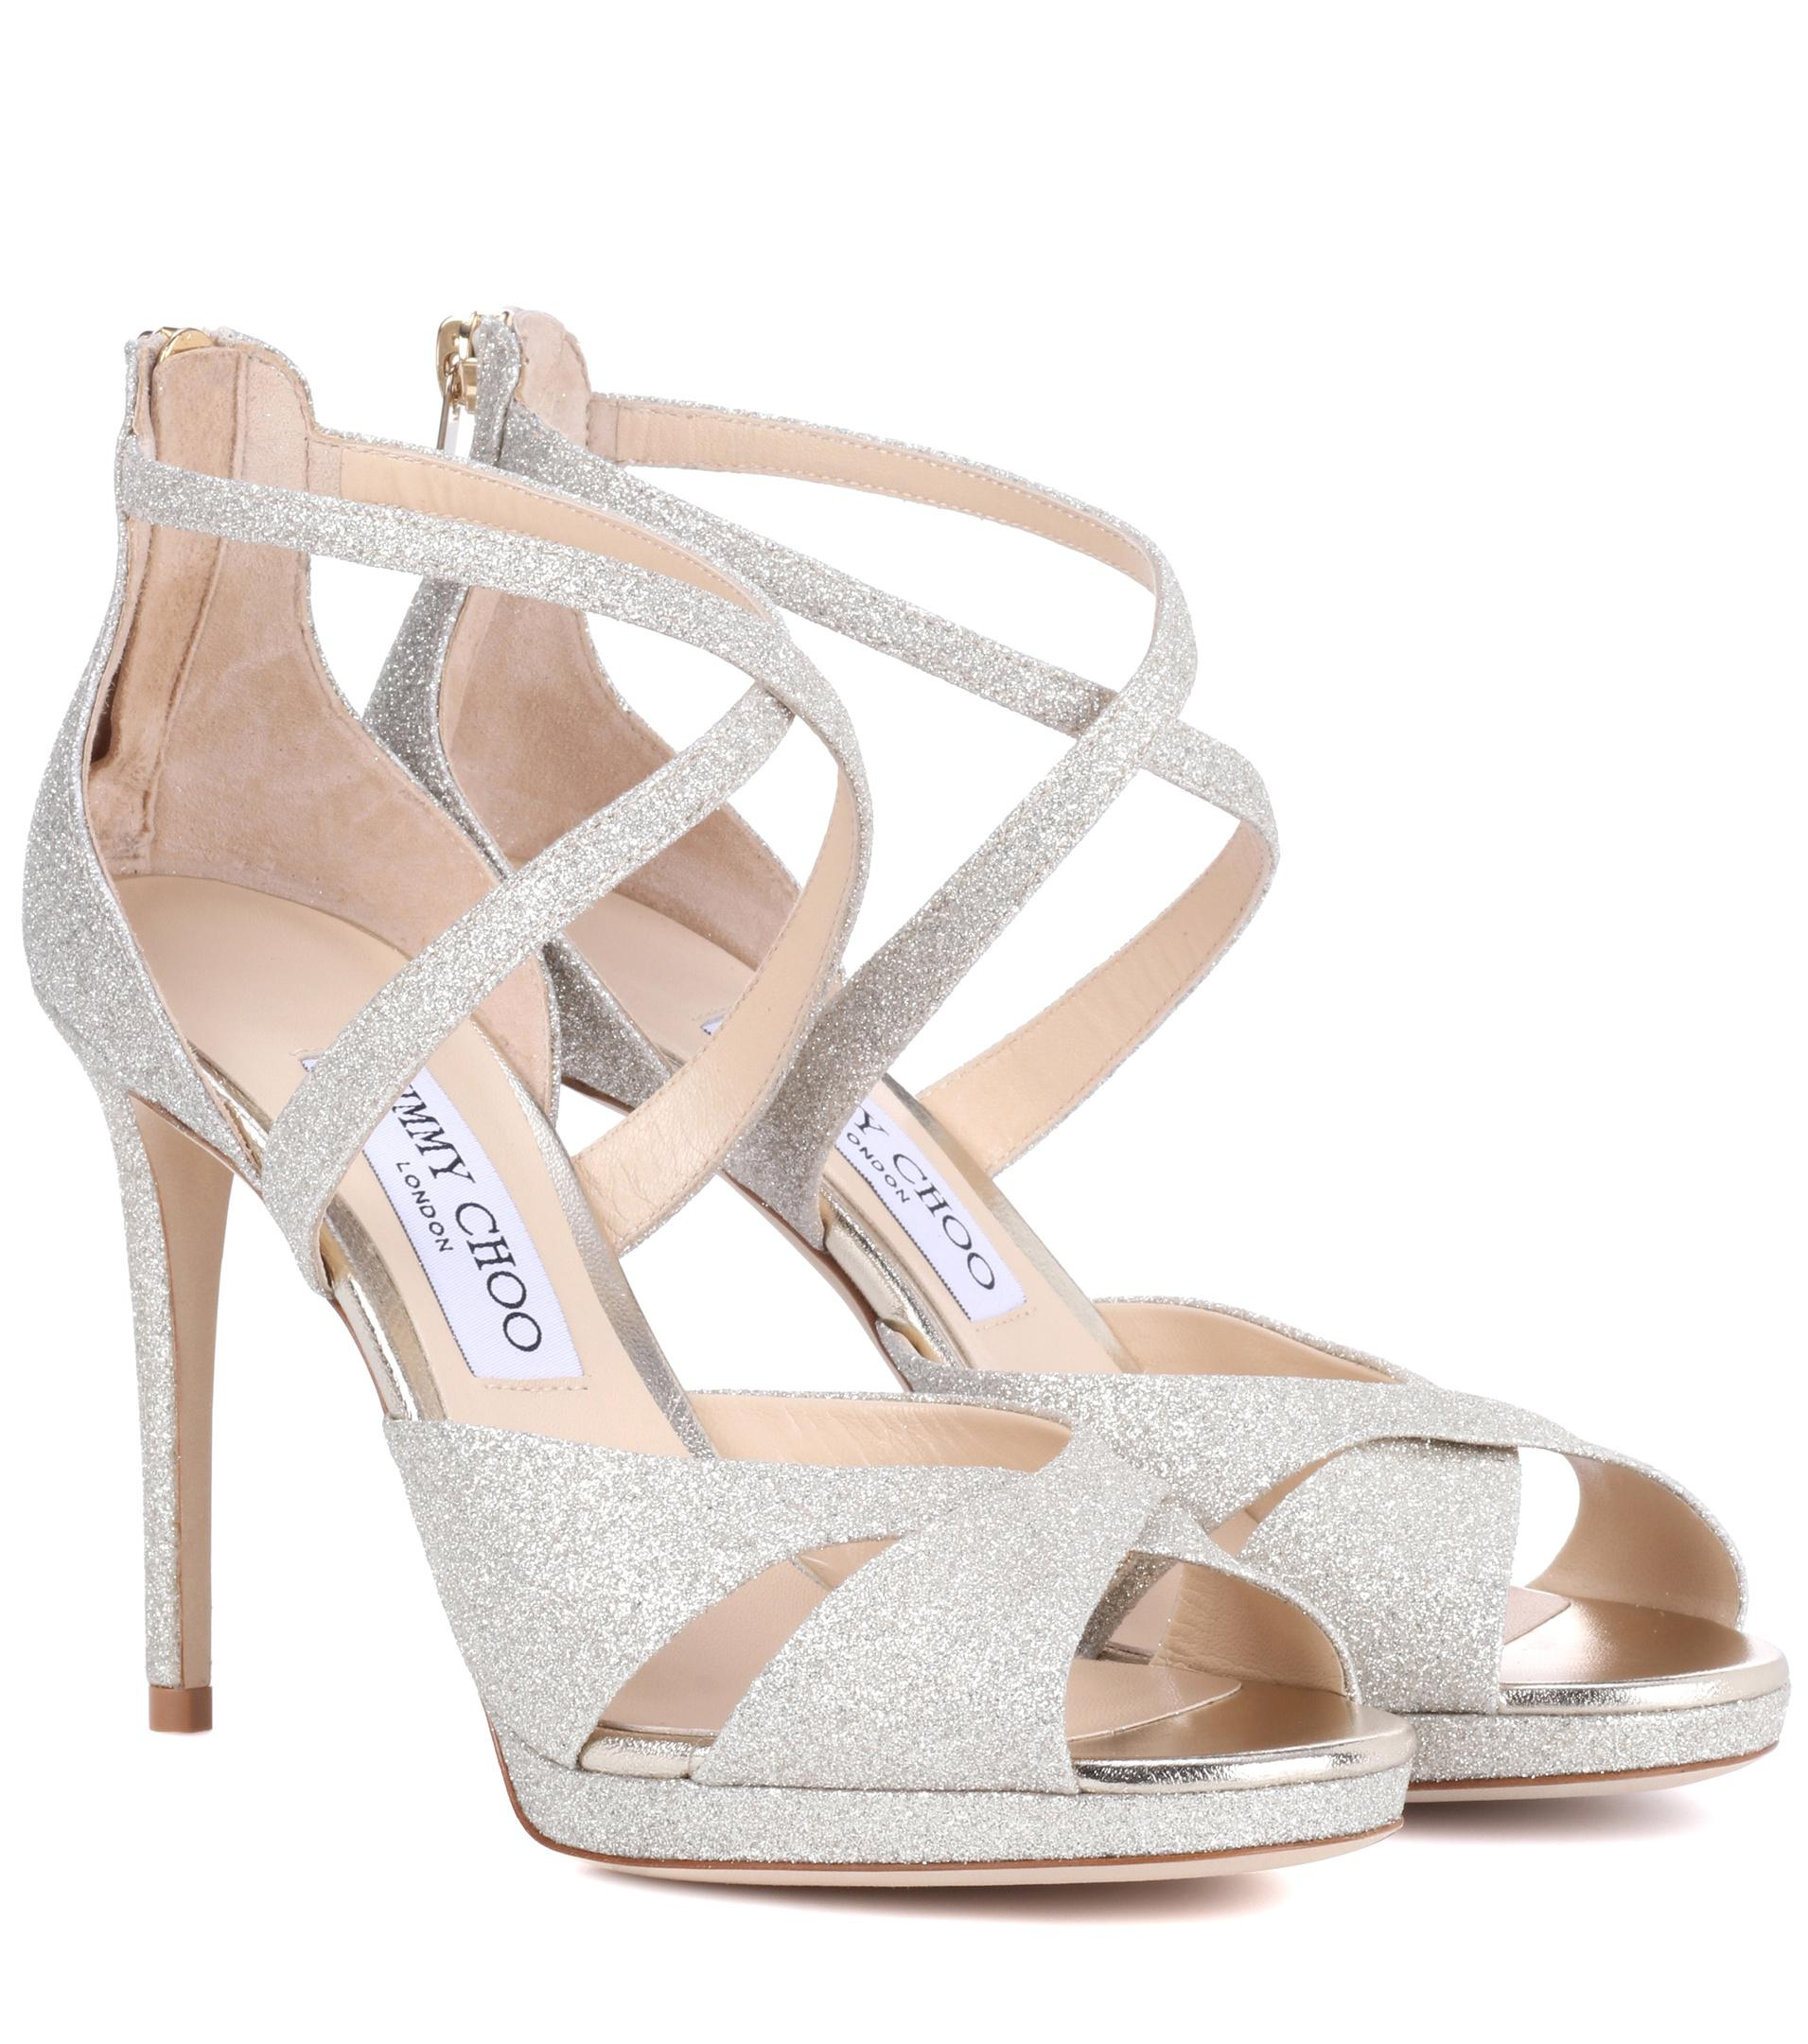 Lorina 100 glitter sandals - Metallic Jimmy Choo London 8rypmZRlKU